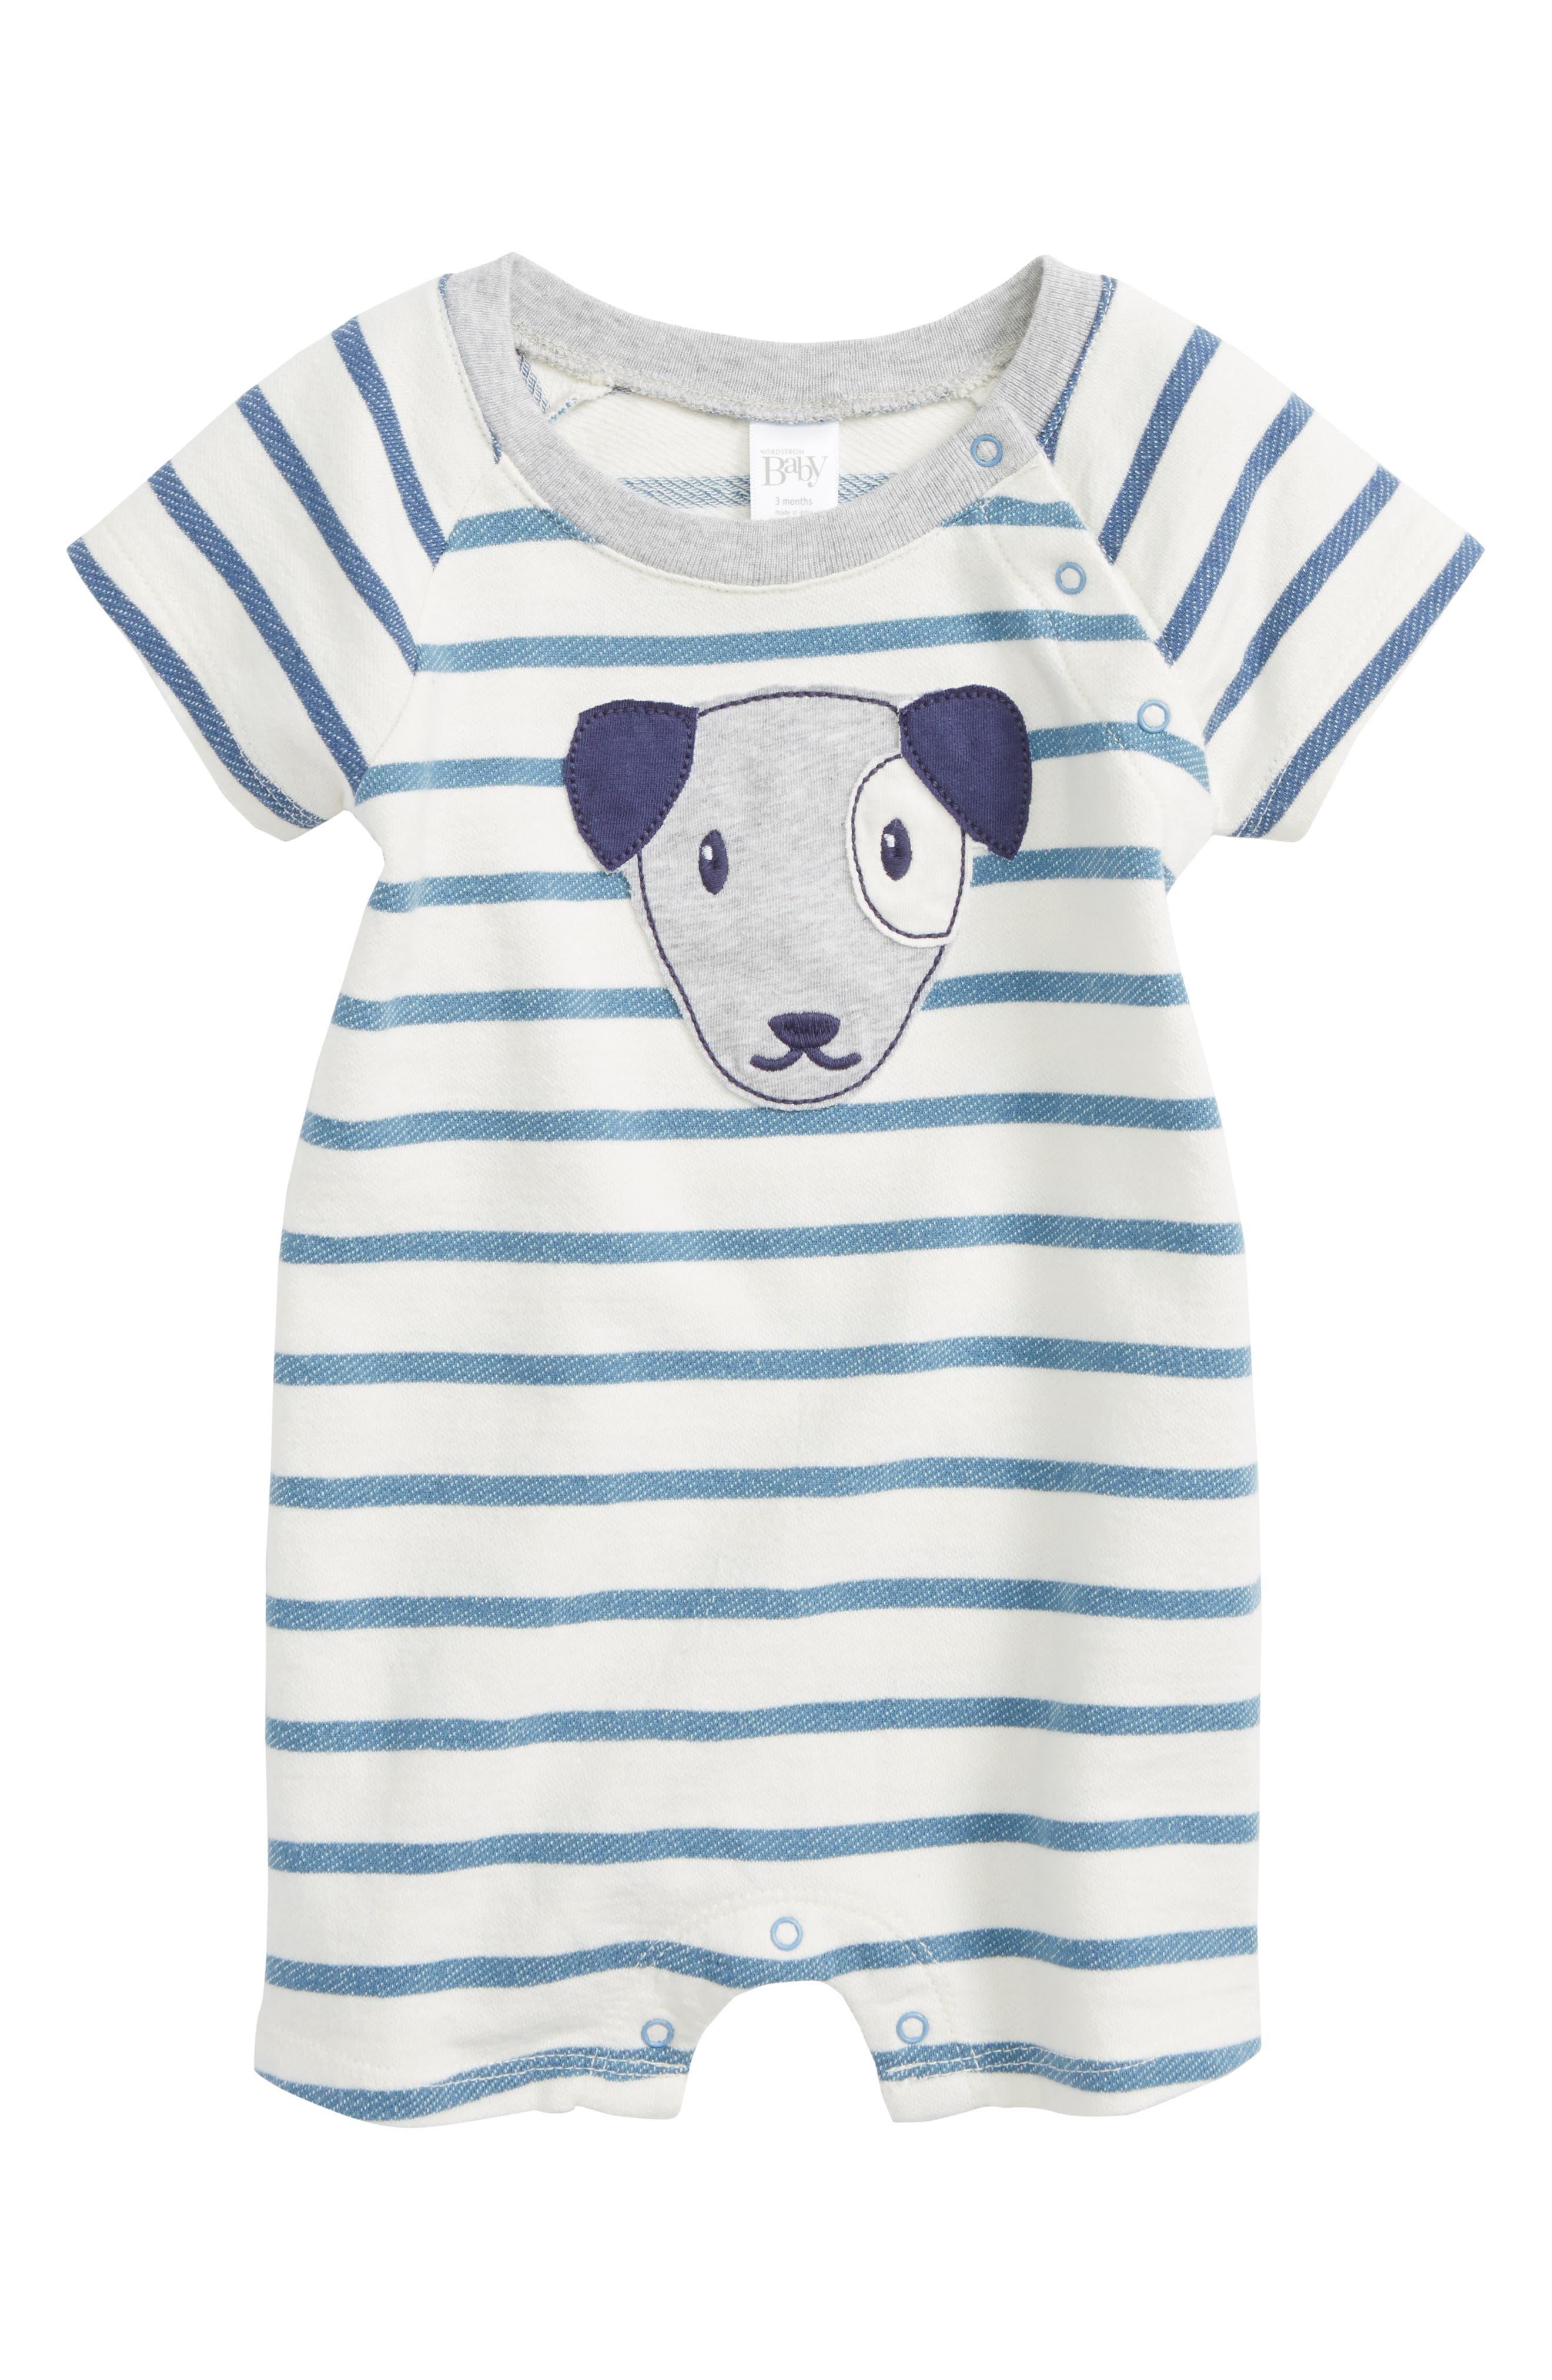 Main Image - Nordstrom Baby Dog Appliqué Stripe Romper (Baby Boys)